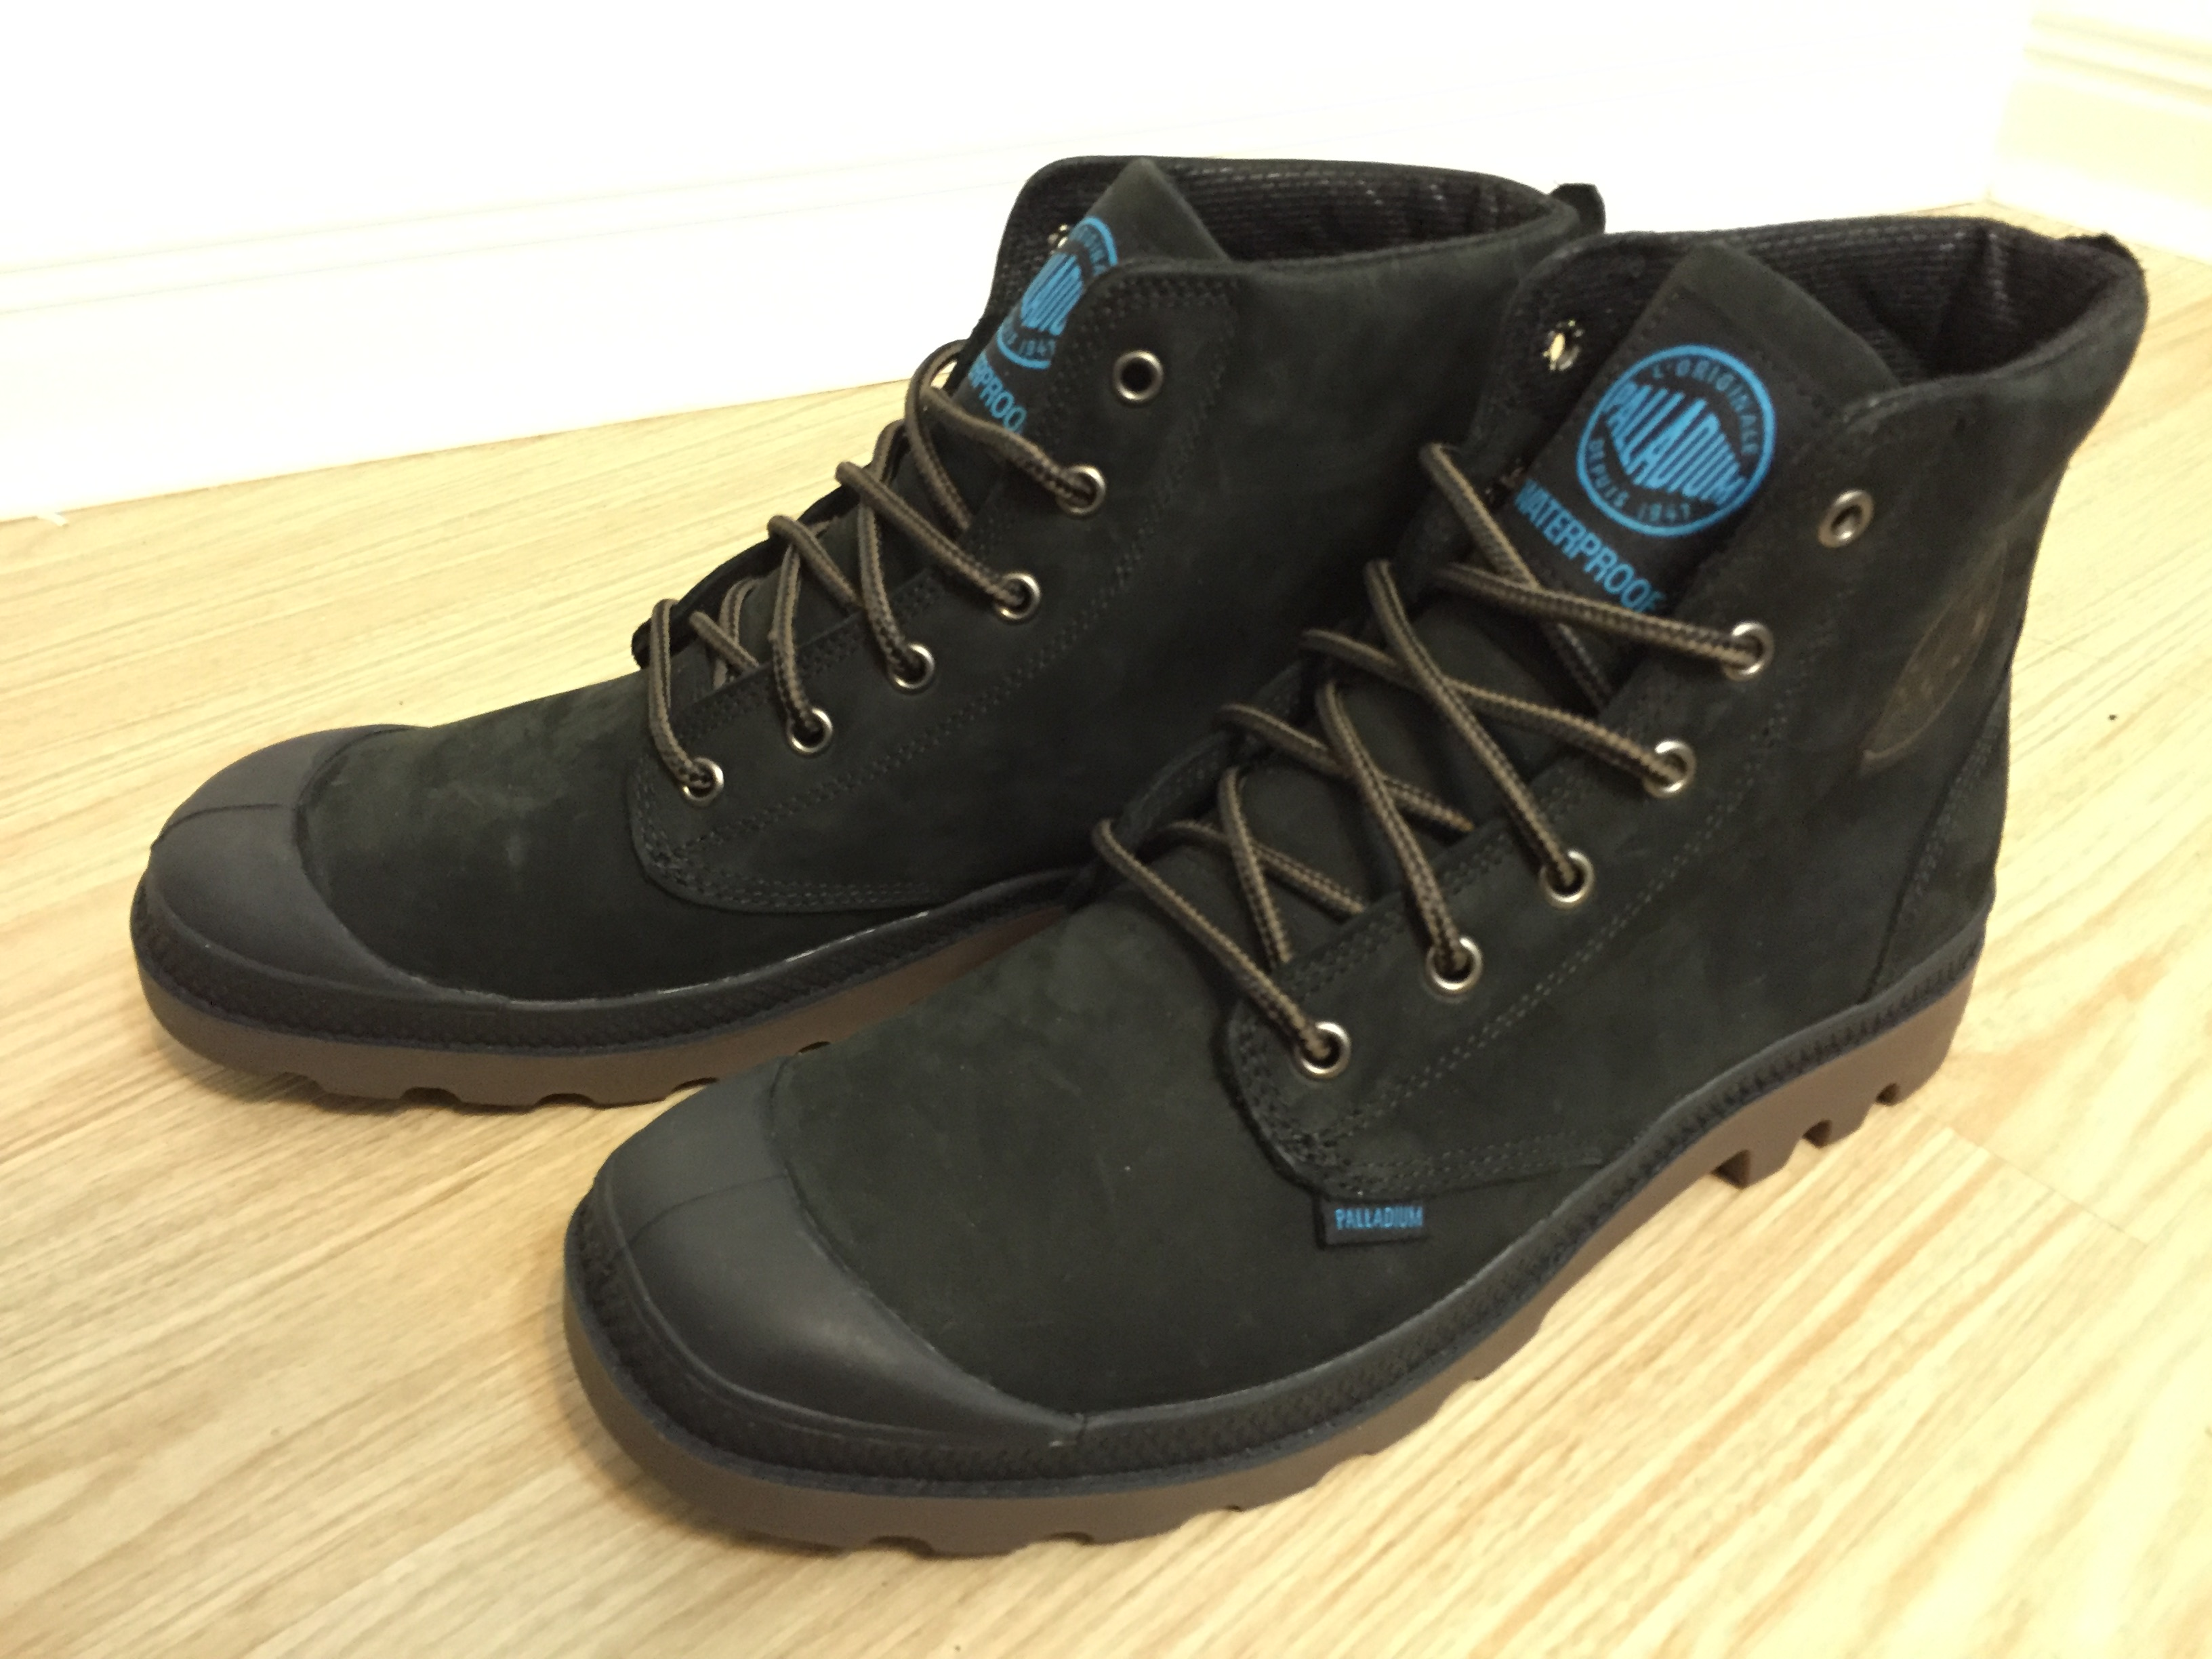 Palladium 防水靴~入手! - 鞋靴樂收藏 - 時尚討論區 - Mobile01